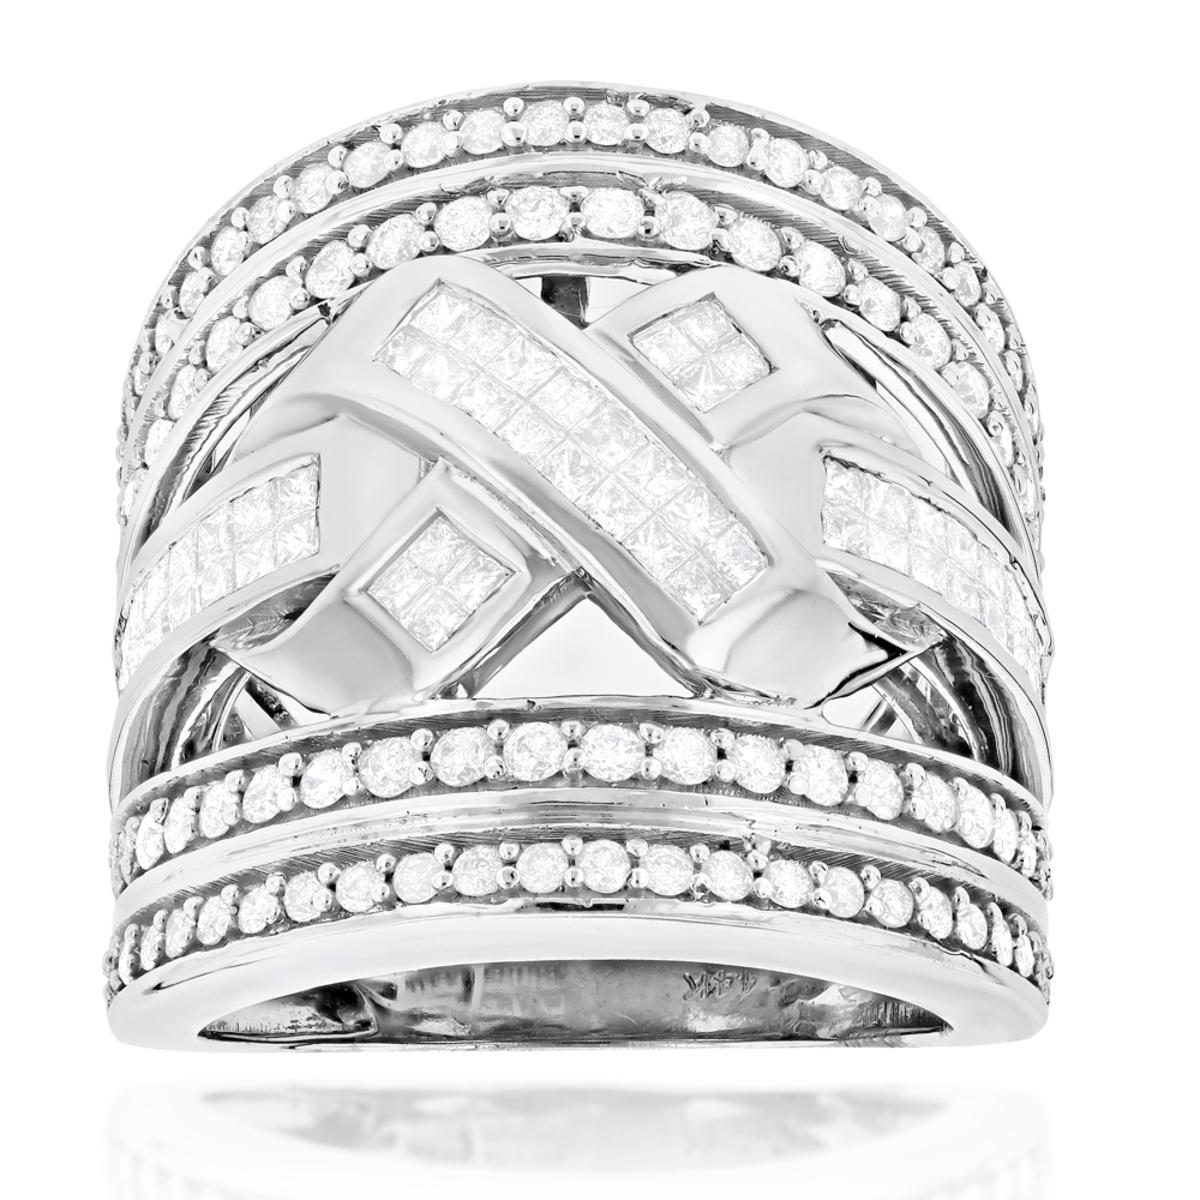 14K Gold Criss Cross Diamond Ring 2.20ct